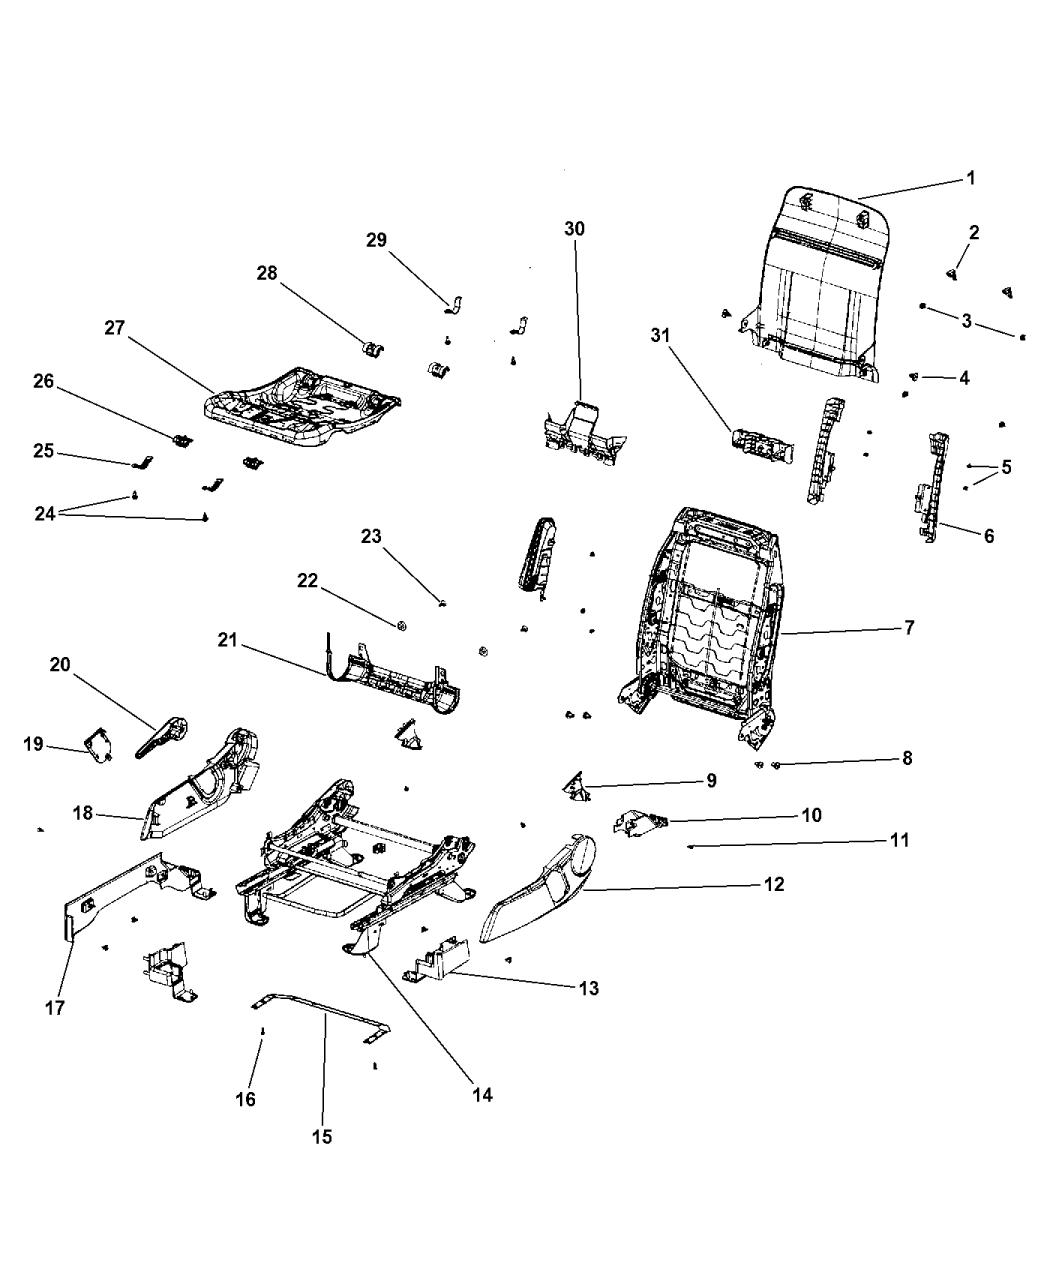 2011 Jeep Patriot Adjusters, Recliners & Shields